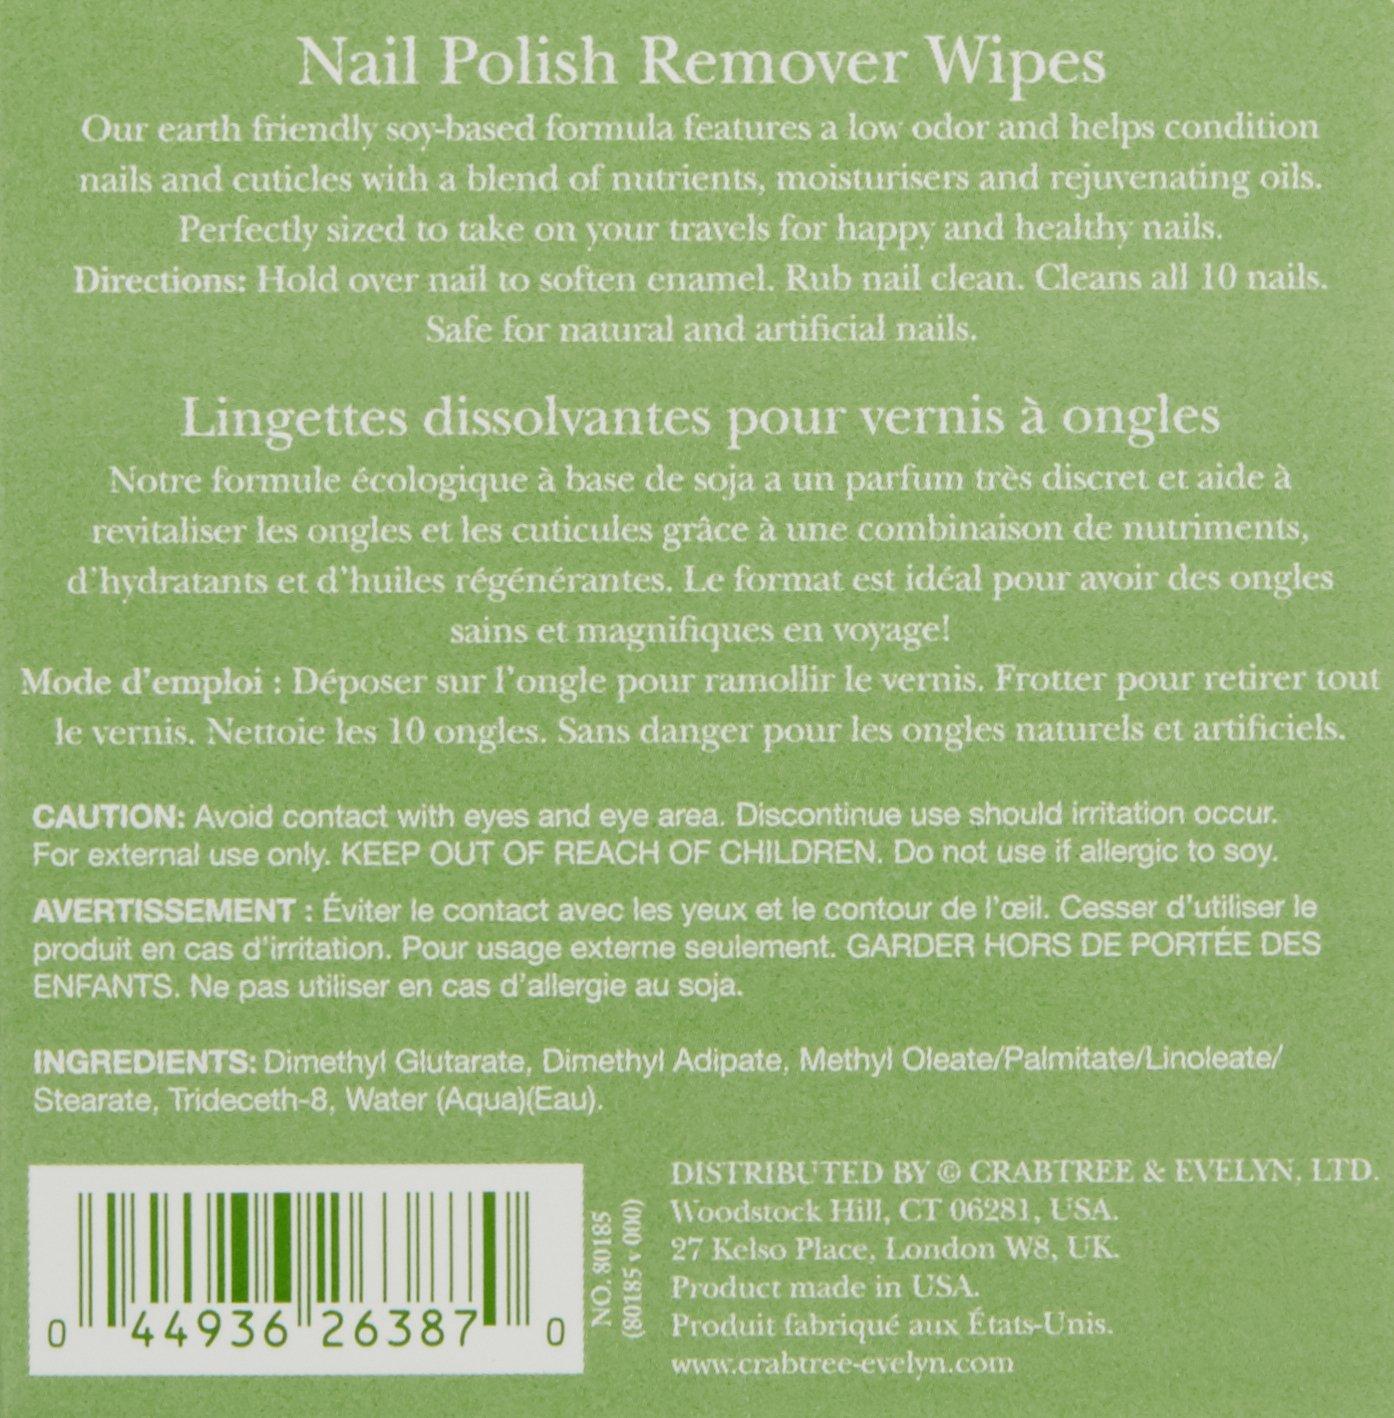 Amazon.com: Crabtree & Evelyn Nail Polish Remover Wipes: Luxury Beauty